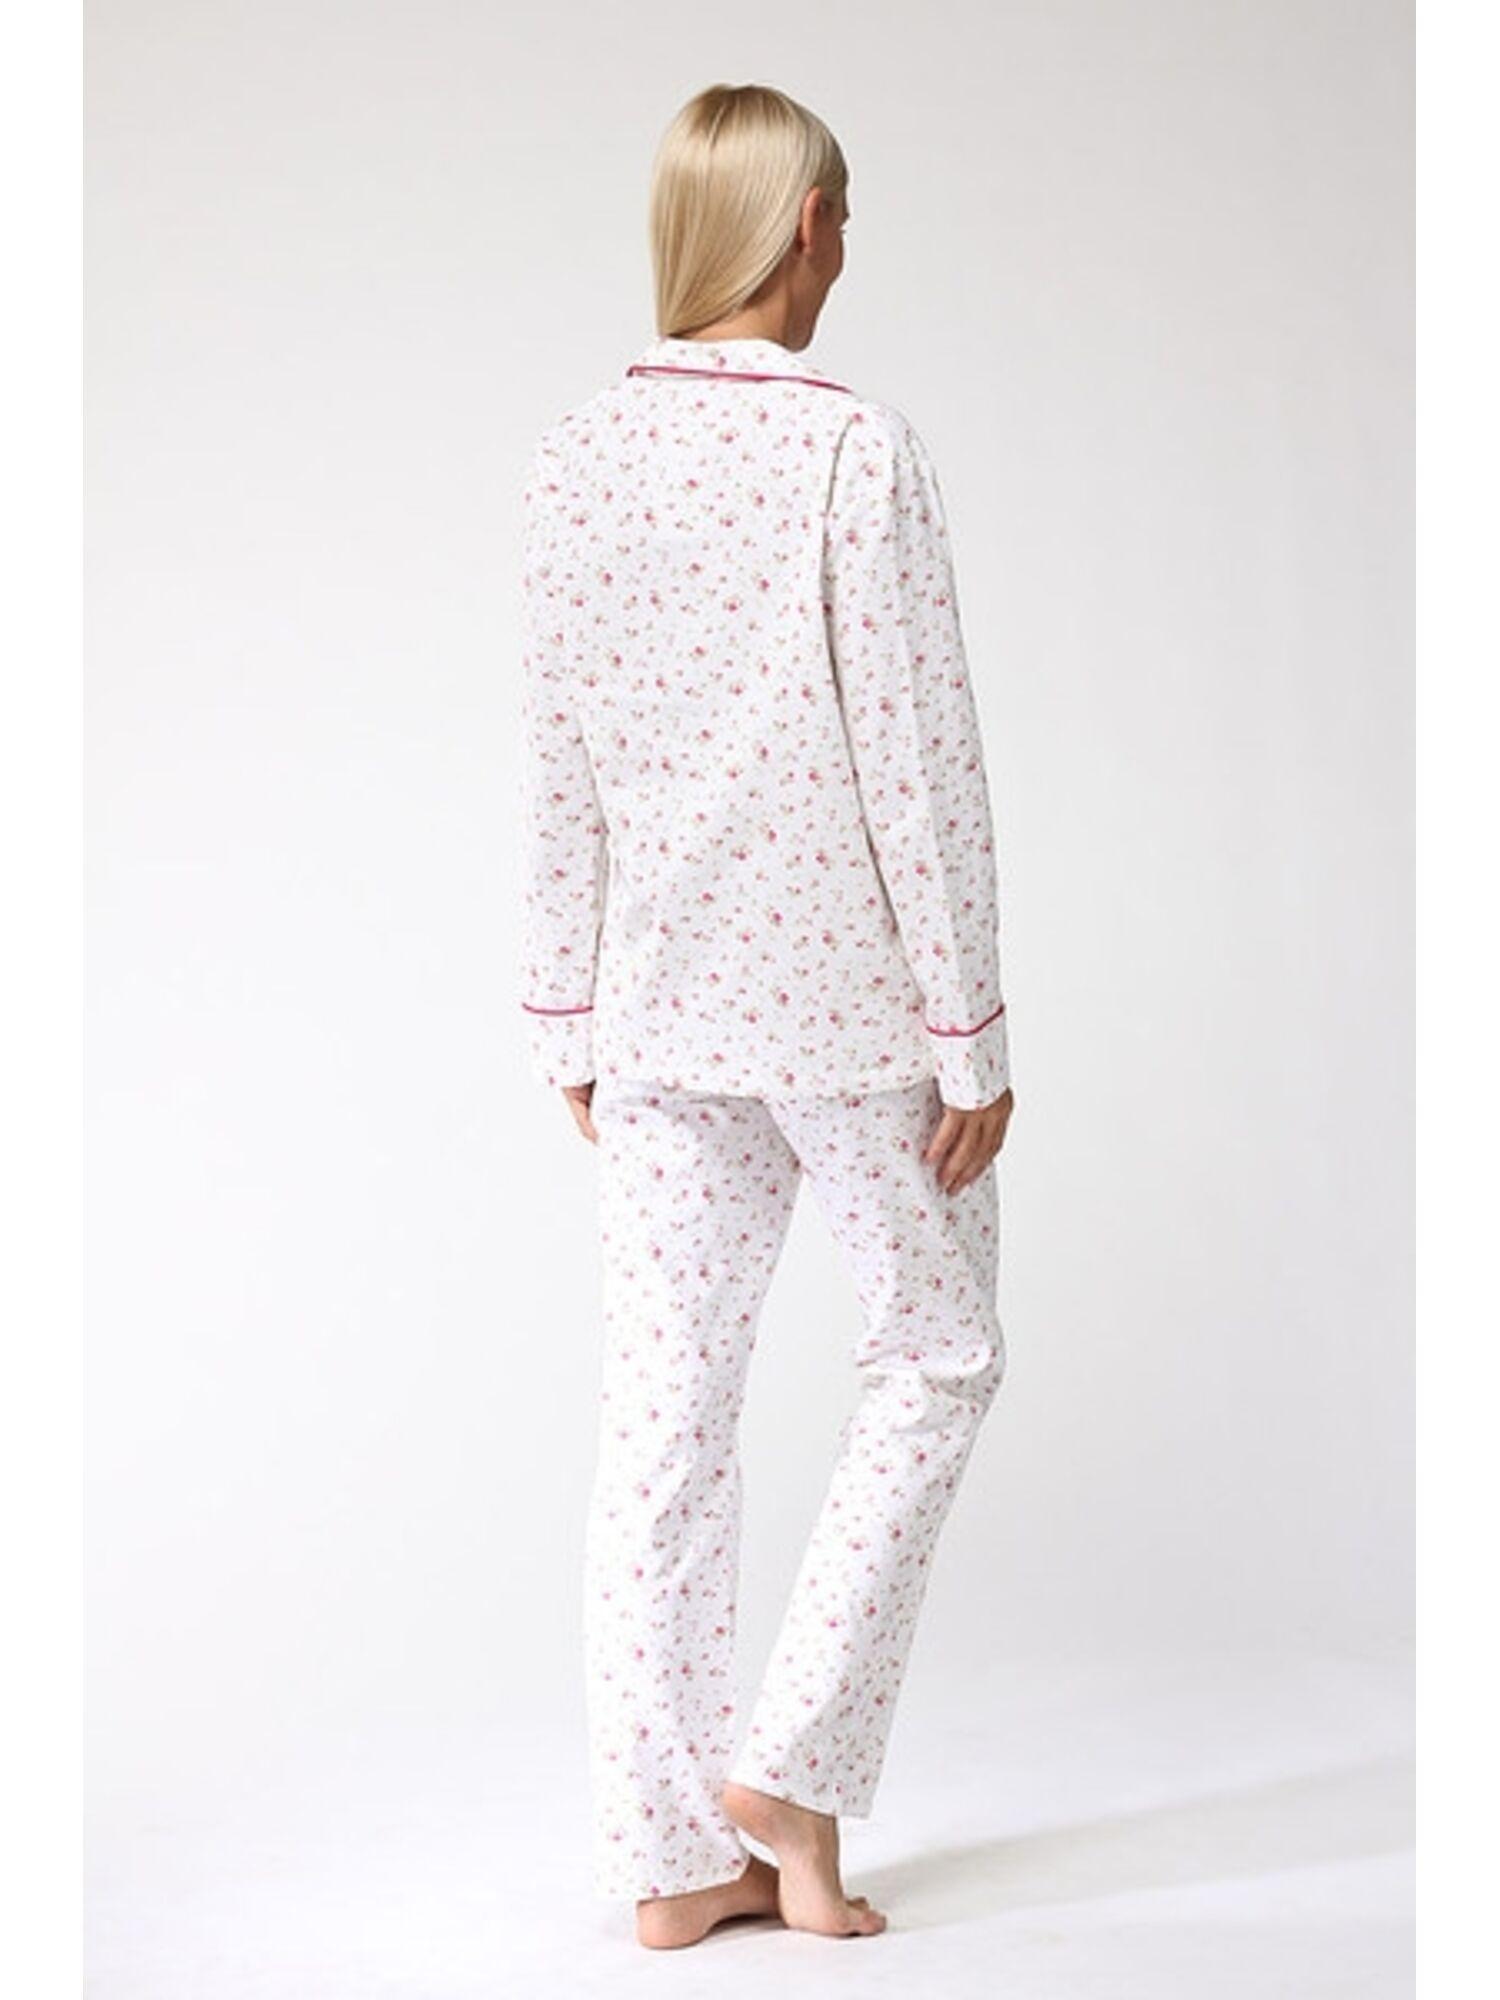 Пижама женская из фланели 1401 Délicate белый/розовый, PECHE MONNAIE